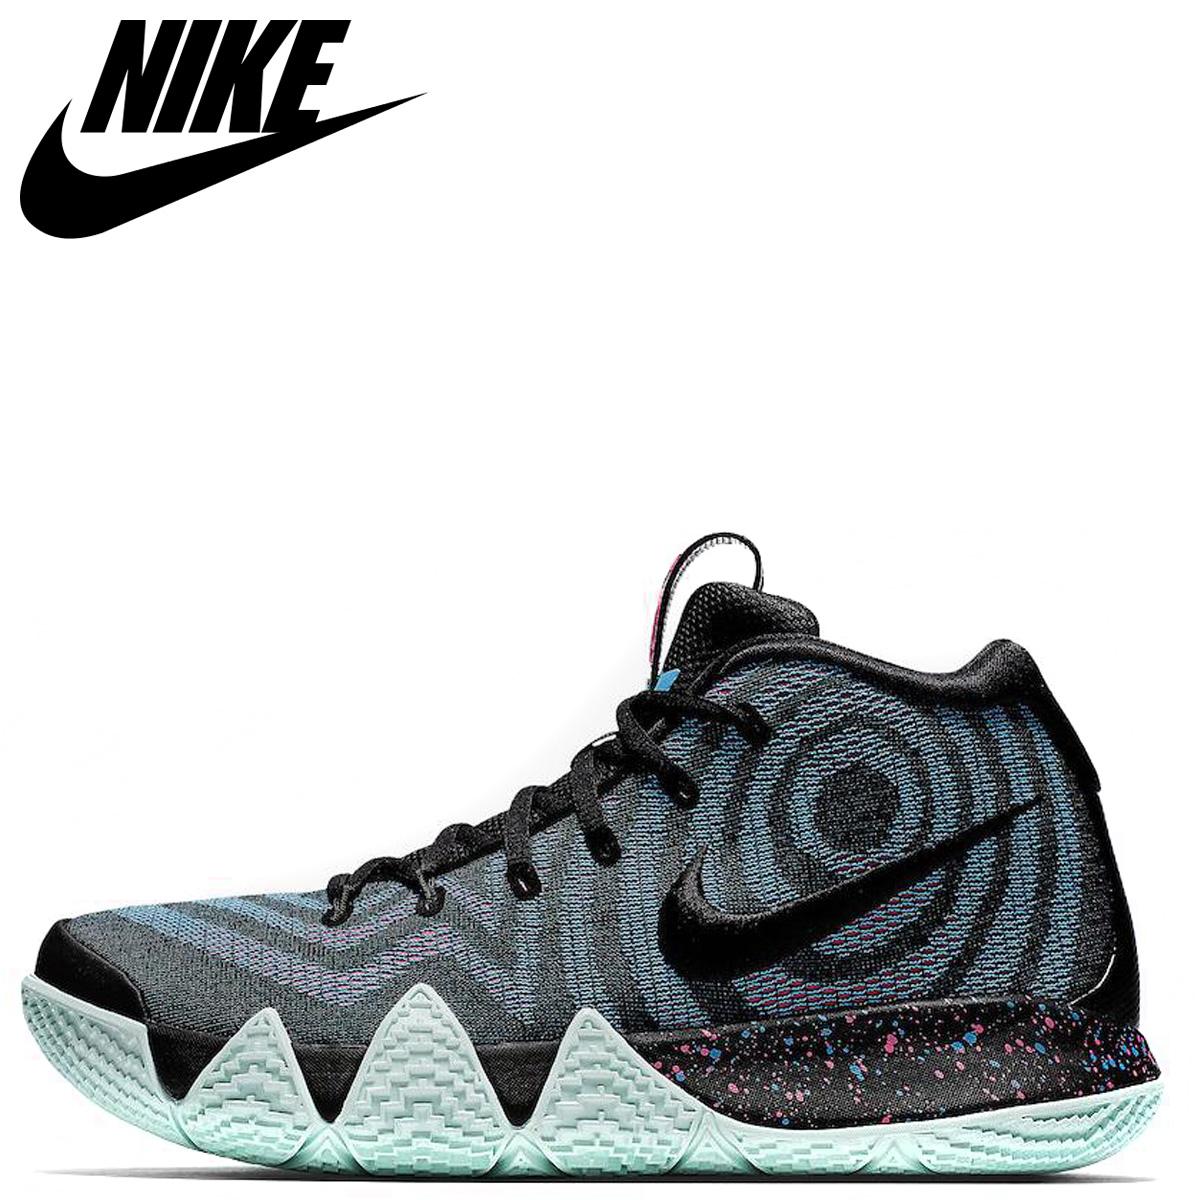 ddaee0b0fdb Whats up Sports  Nike NIKE chi Lee 4 sneakers men KYRIE 4 EP black ...